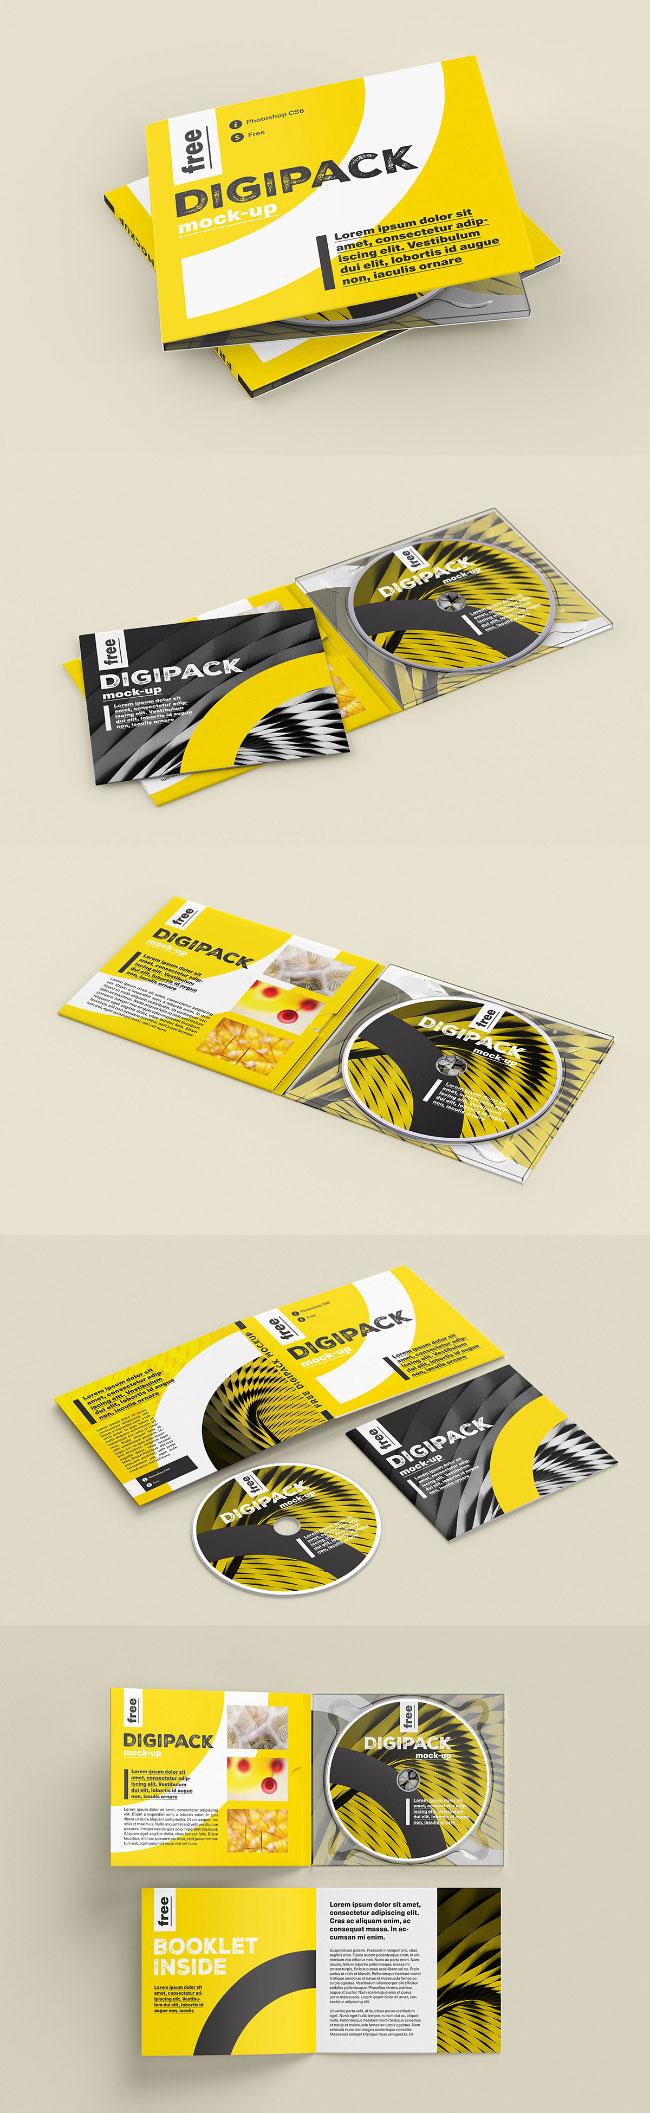 p429 - مگاپک موکاپ کاور سی دی یا دی وی دی با قاب و جلد DVD & CD